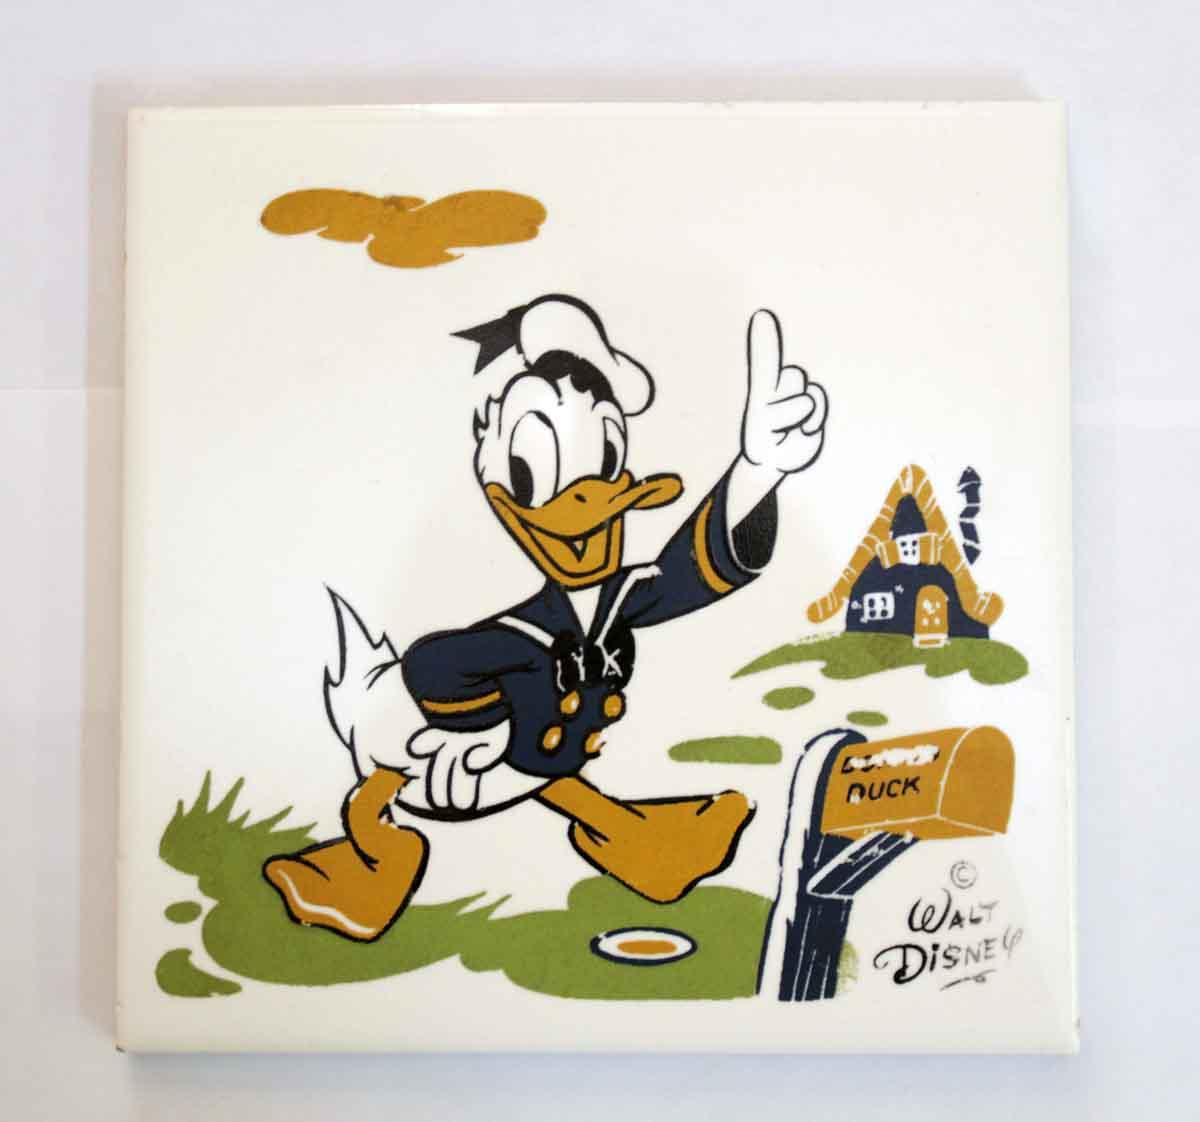 Walt Disney Donald Duck Ceramic Tile